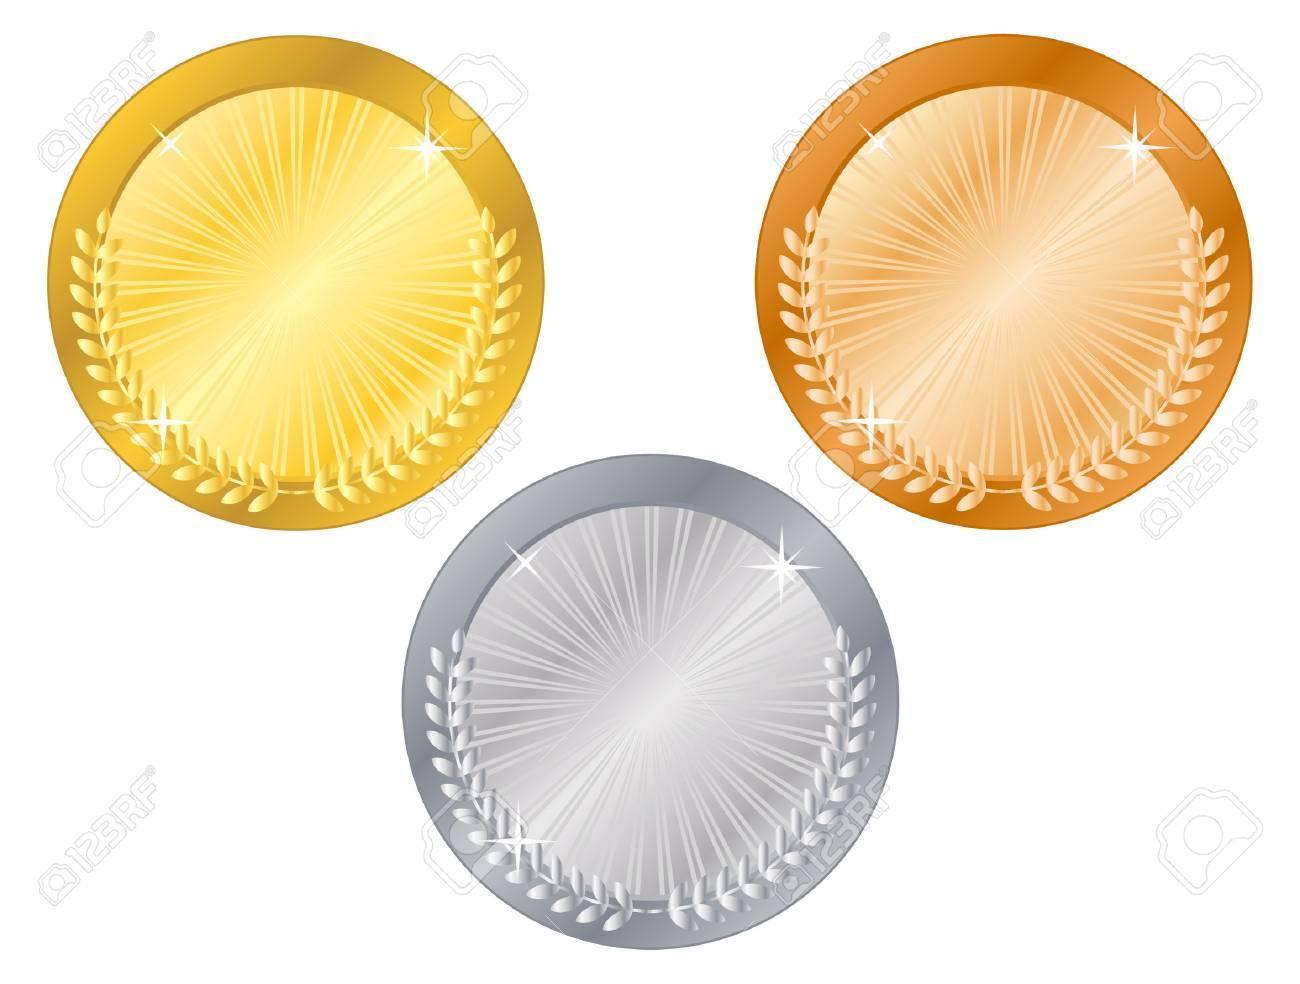 Medals-5 Stock Vector - 3881235